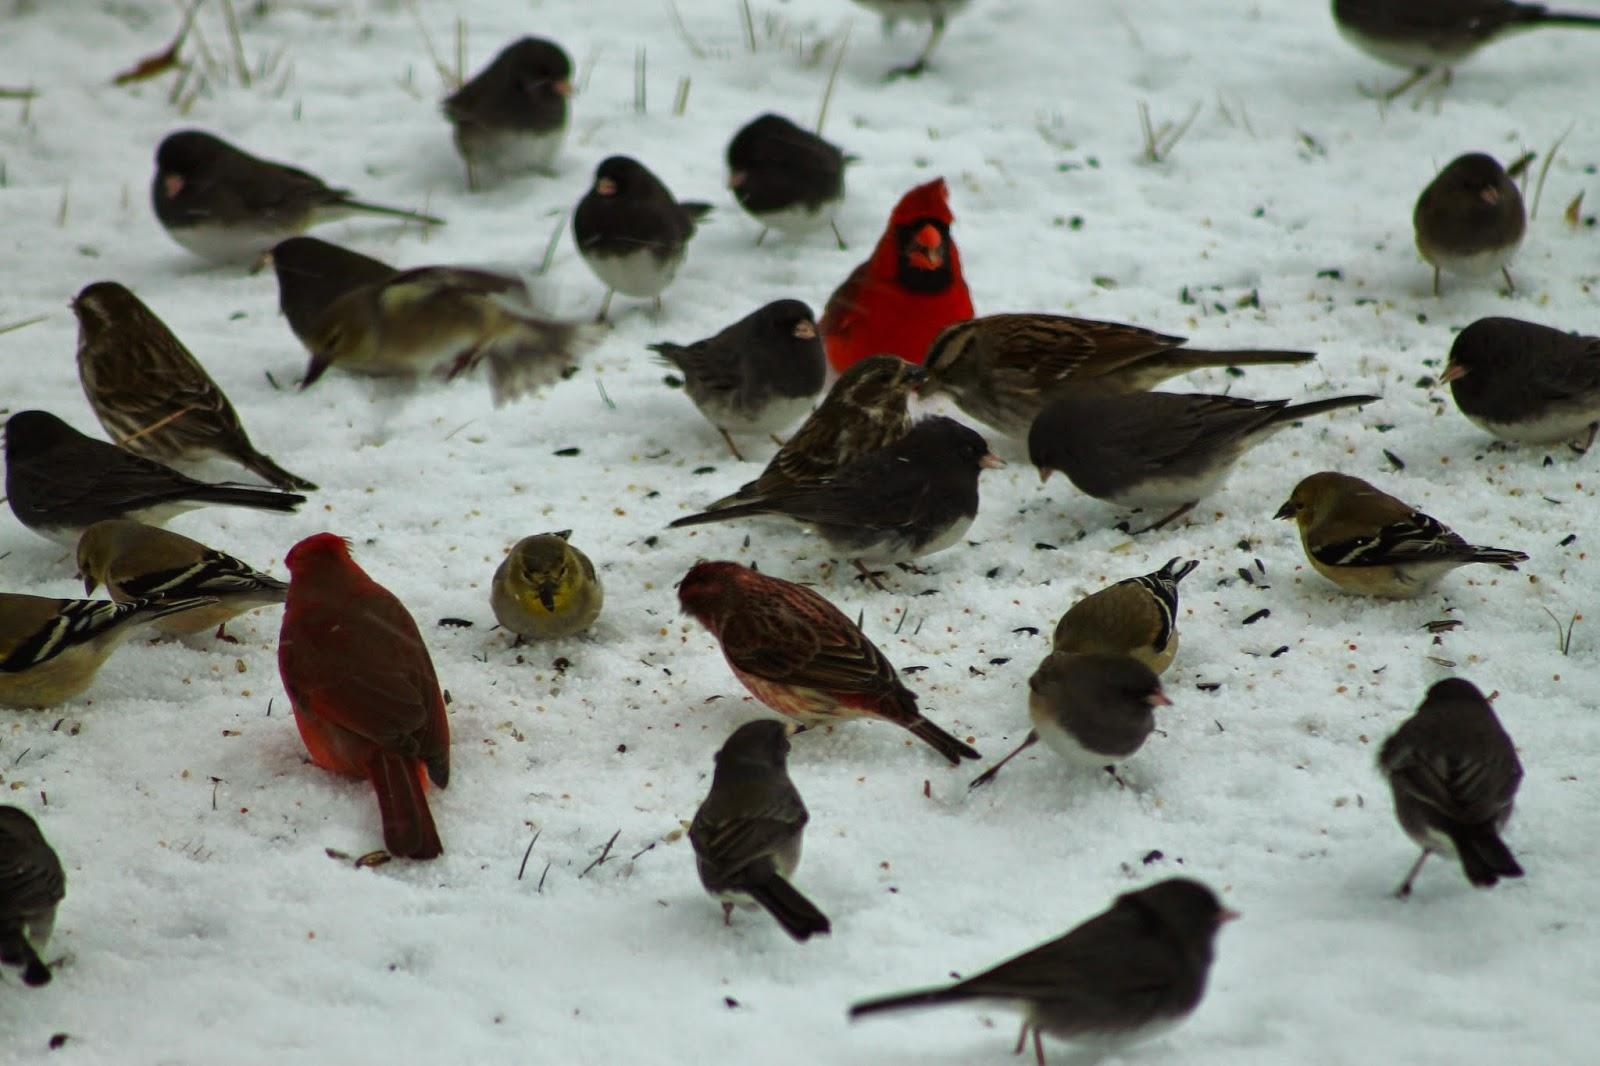 ozark highlands of missouri great backyard bird count february 13 16